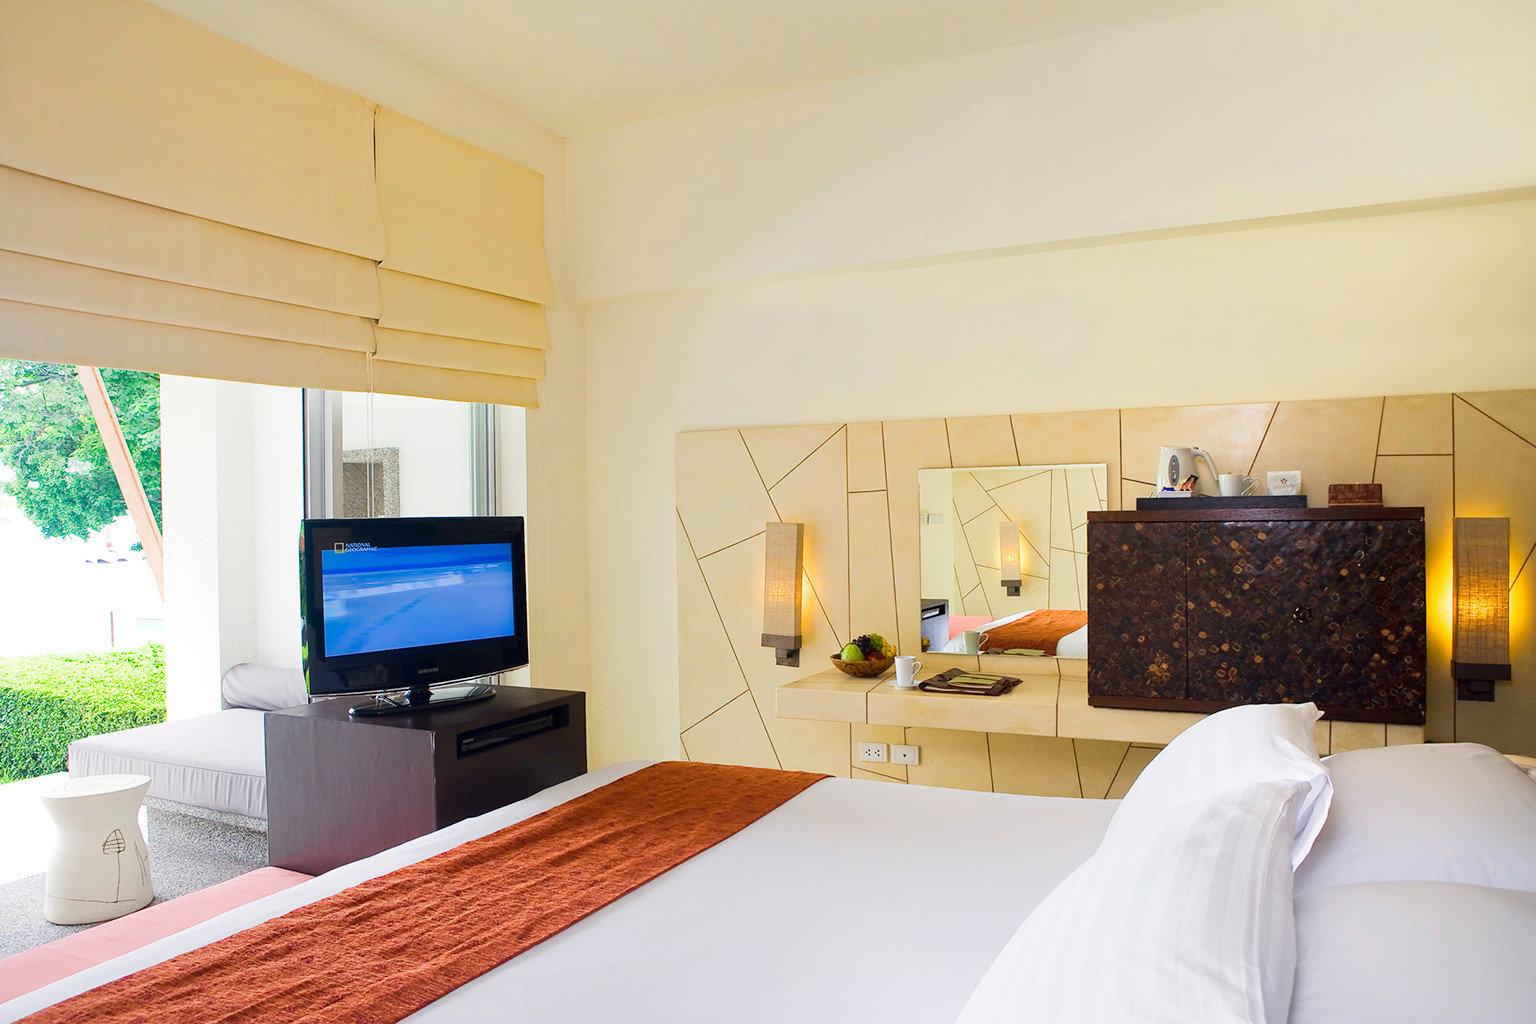 Beach Bedroom Family Modern Resort property living room Suite Villa home cottage condominium